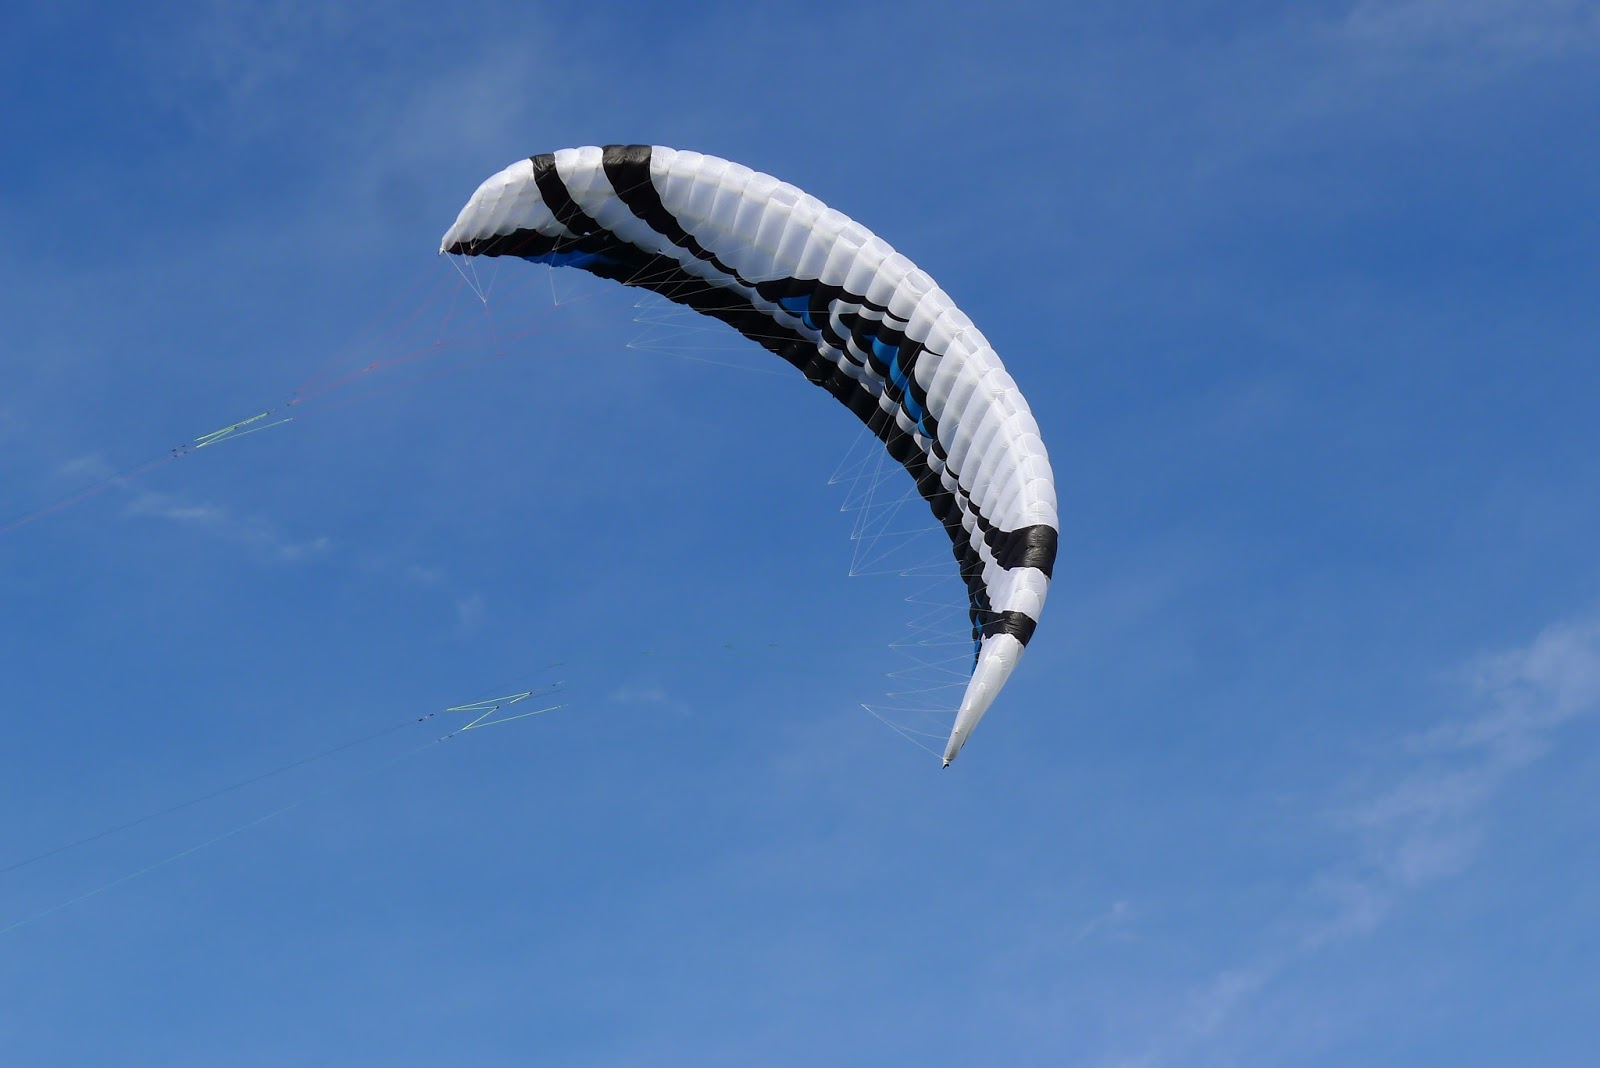 VENDUE ! Flysurfer Speed IV Lotus 18m complète 1390 € quasi neuve  P1260090